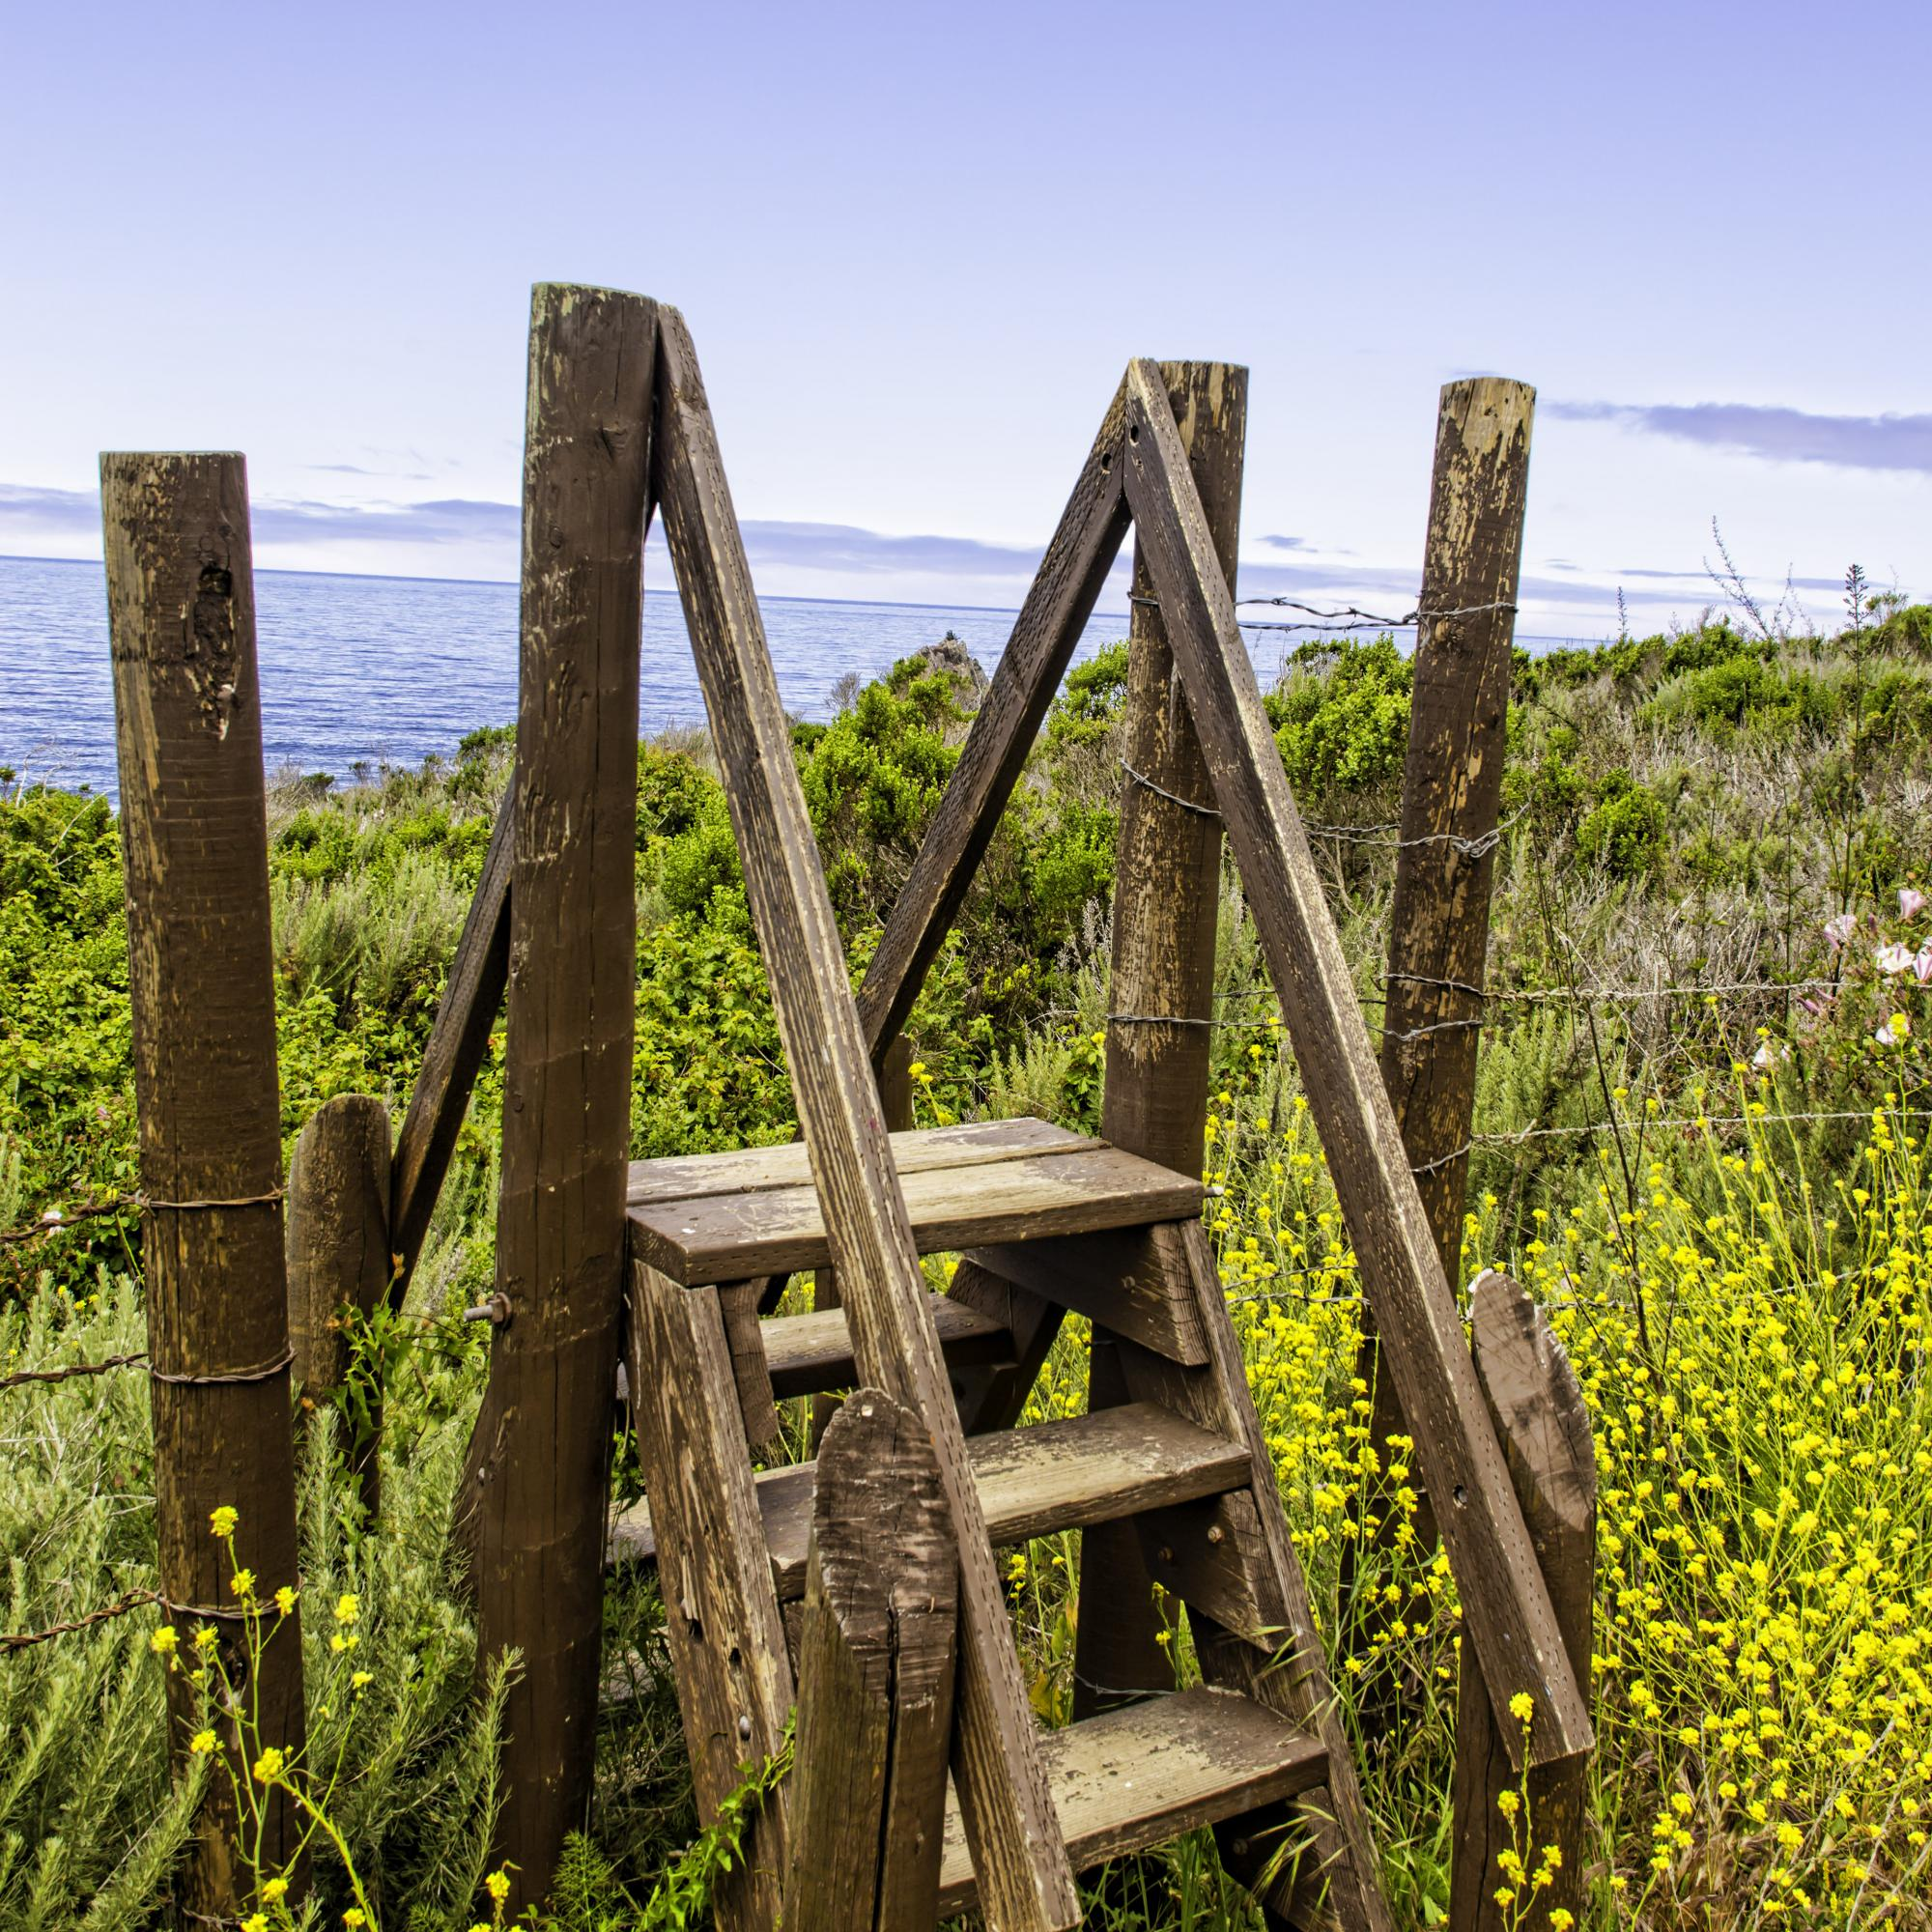 Dan Blackburn Wooden Steps & Wild Mustard South of Big Sur California_MGL9223